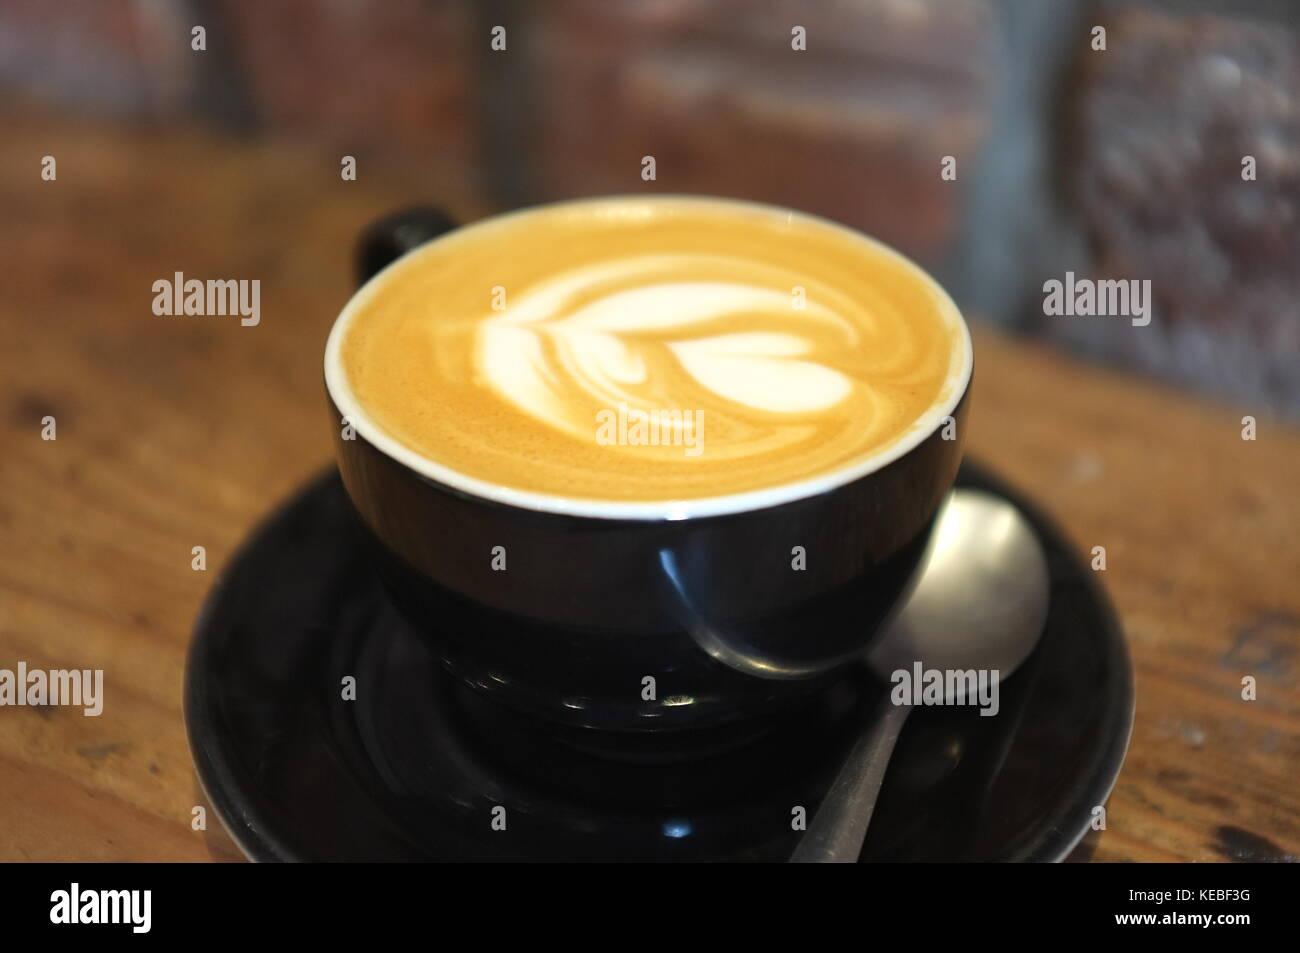 A flat white coffee at Riverhill Coffee Bar, Glasgow, Scotland, United Kingdom. 16 September 2017. - Stock Image